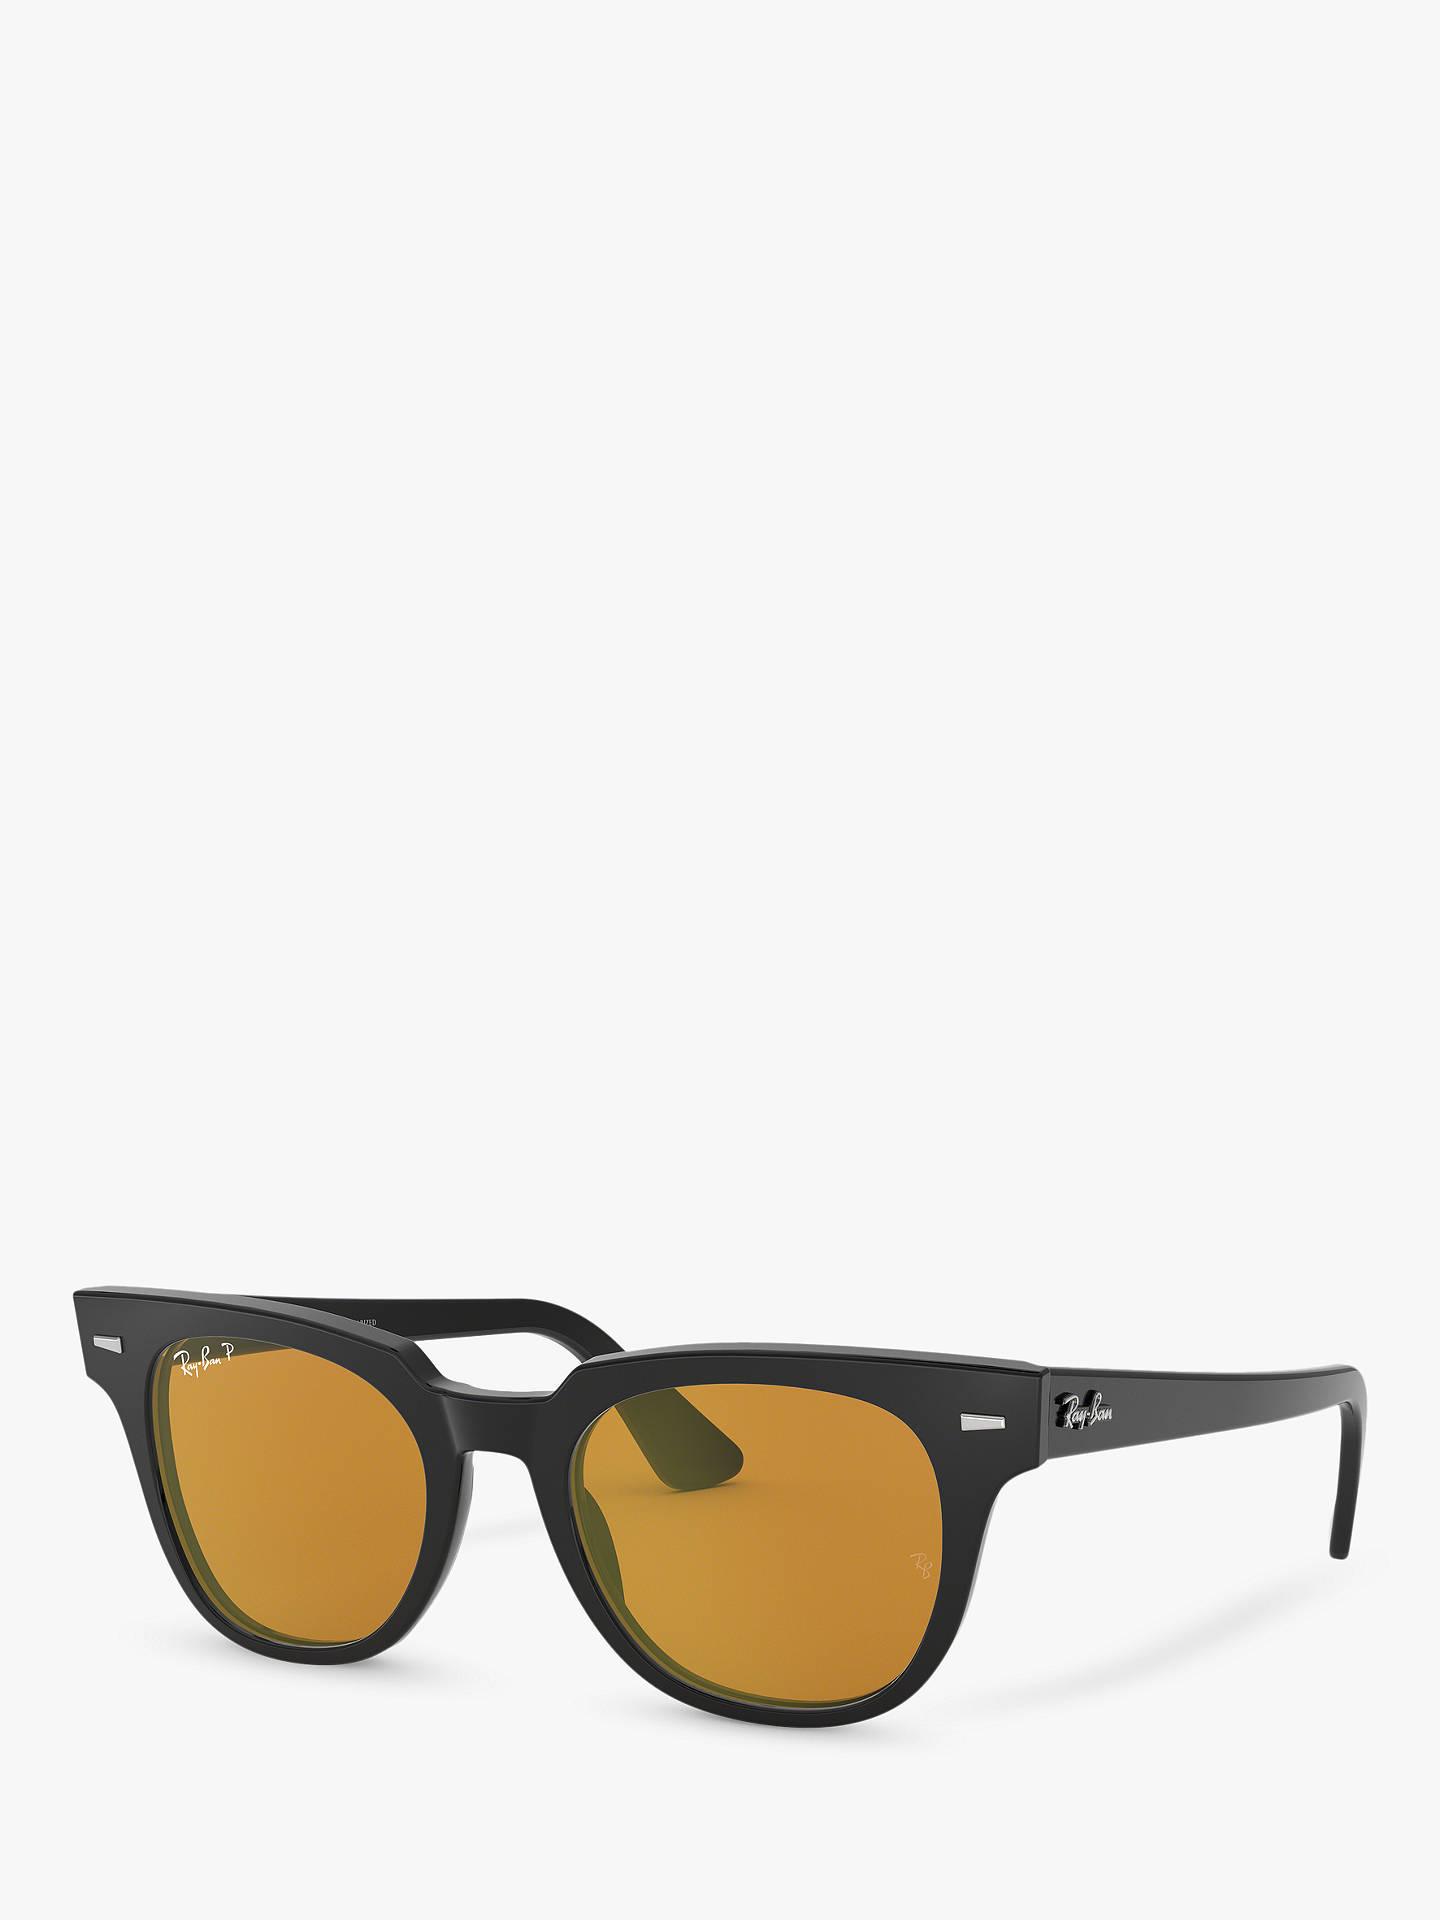 7d79f190b0a Ray-Ban RB2168 Unisex Polarised Square Sunglasses at John Lewis ...